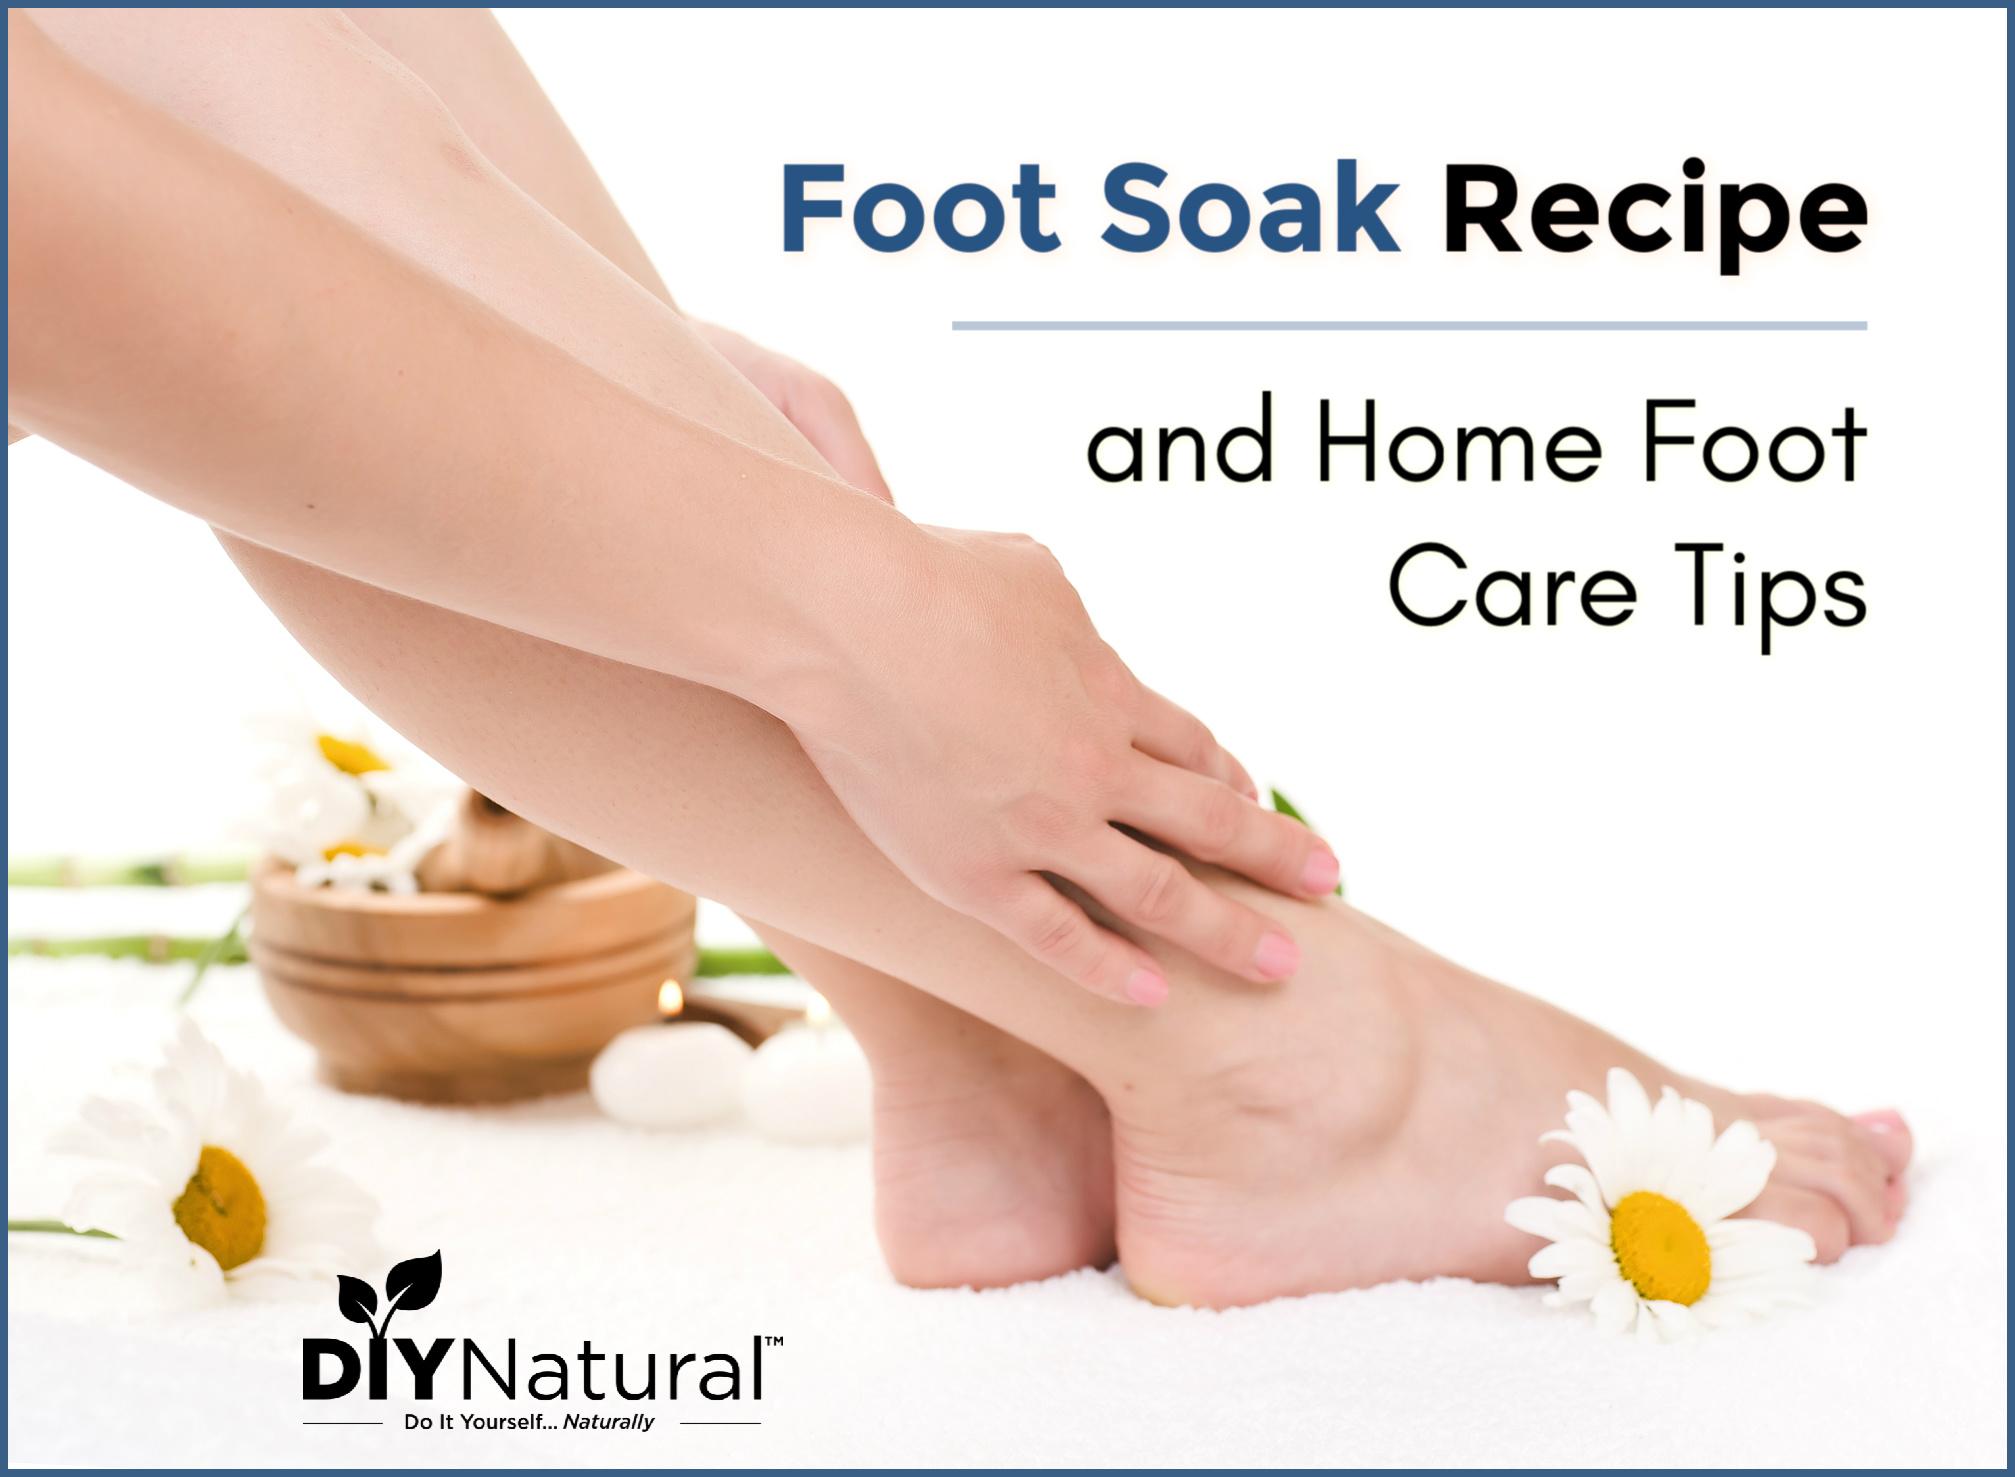 Foot Soak Recipe: A Simple Foot Soak and 8 More Home Foot Care Tips